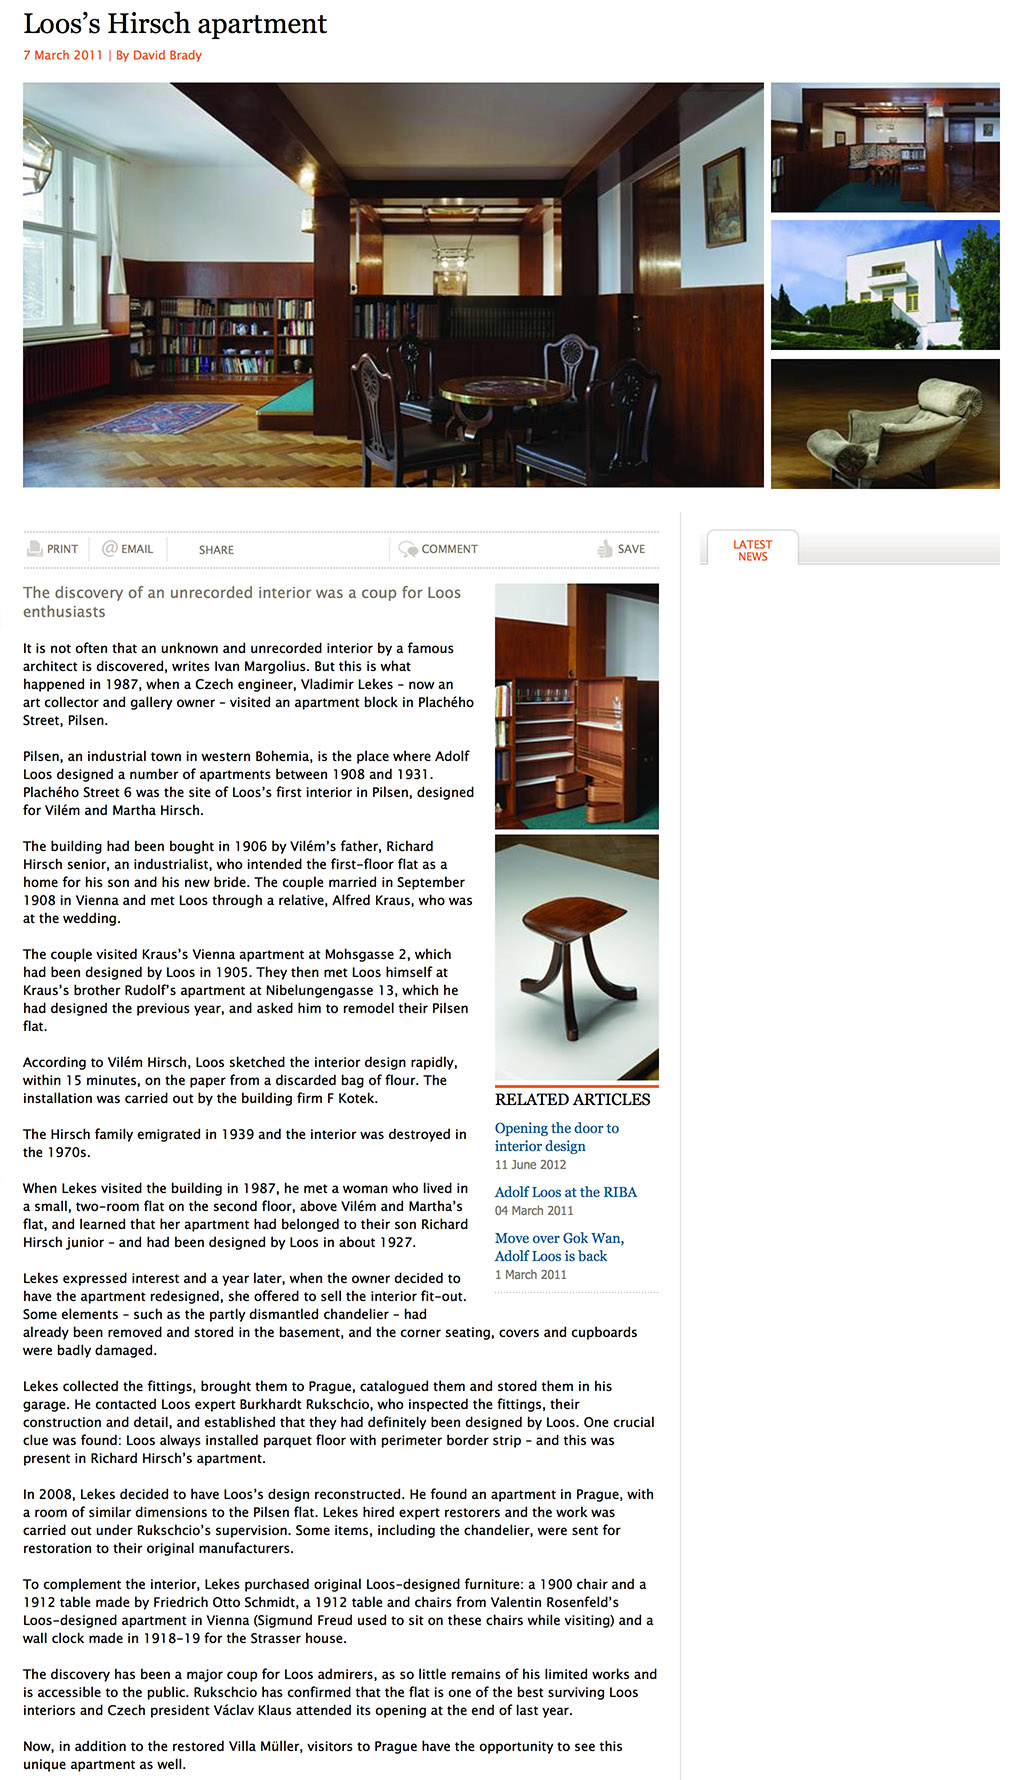 9997 David Brady: Loos's Hirsch apartment, 7. 3. 2011